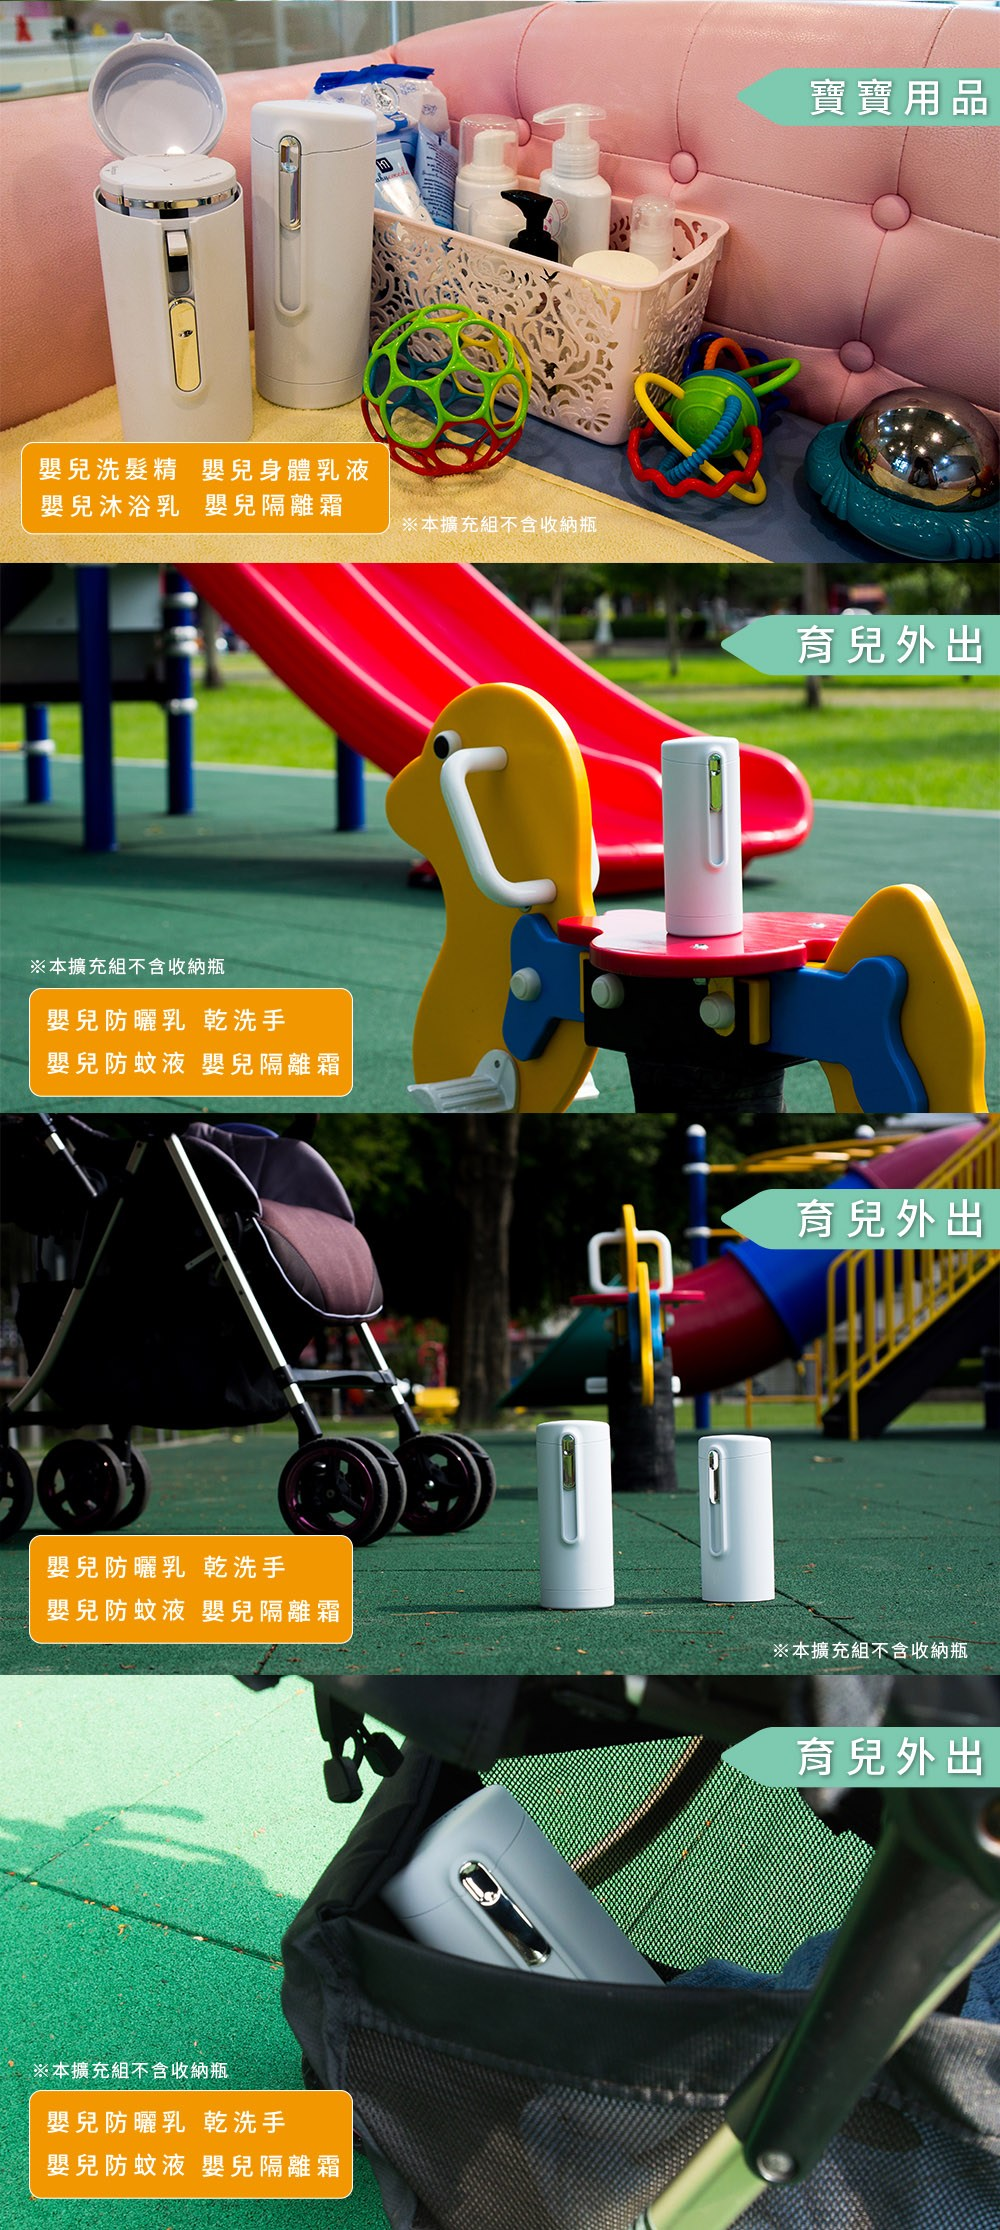 TIC BOTTLE V2.0裝寶寶沐浴用品,乳液,隔離霜放在尿布檯上,TIC BOTTLE V2.0裝寶寶洗手液,防蚊液,防曬乳在公園裡,TIC BOTTLE V2.0在公園遊戲區旁邊有一台COMBI嬰兒車,TIC BOTTLE V2.0放在COMBI嬰兒車